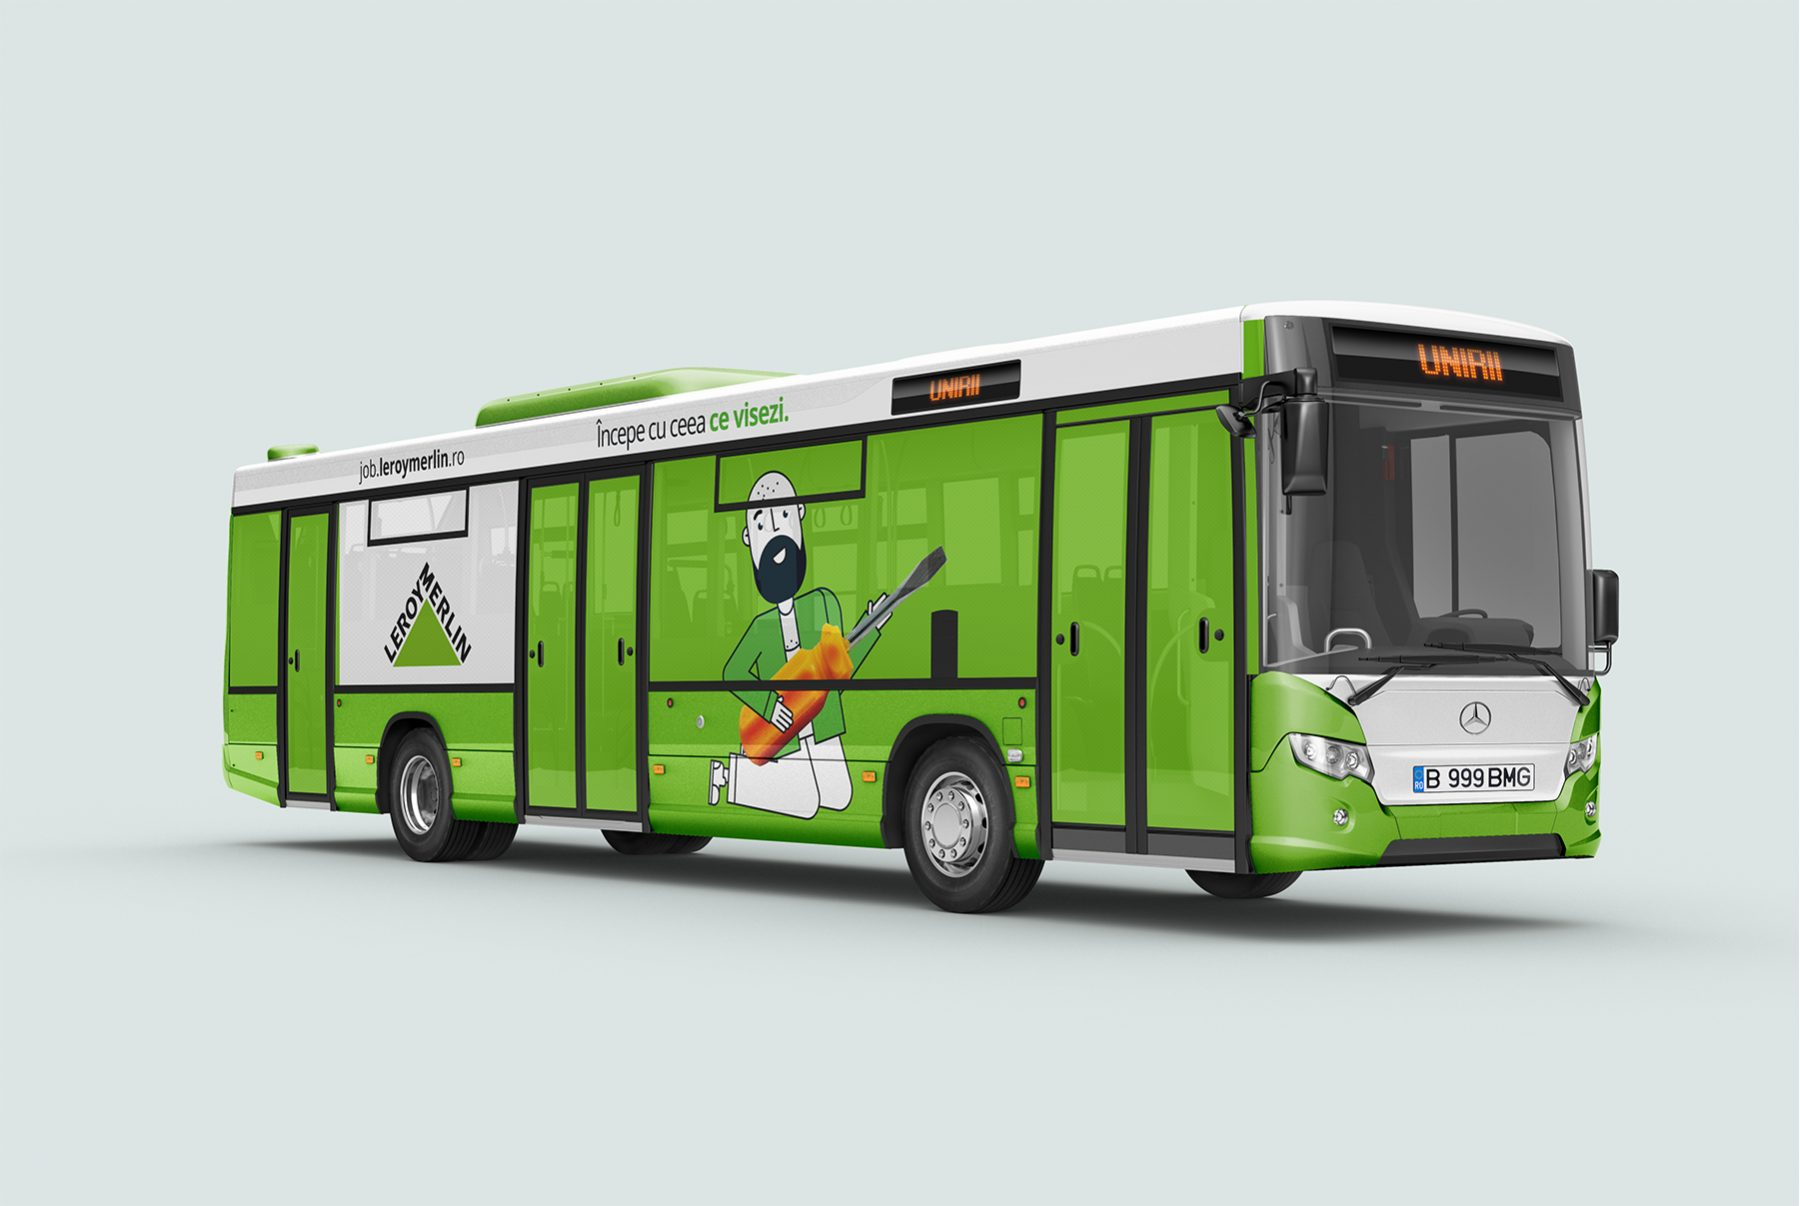 Leroy Merlin brand angajator autobuz oras